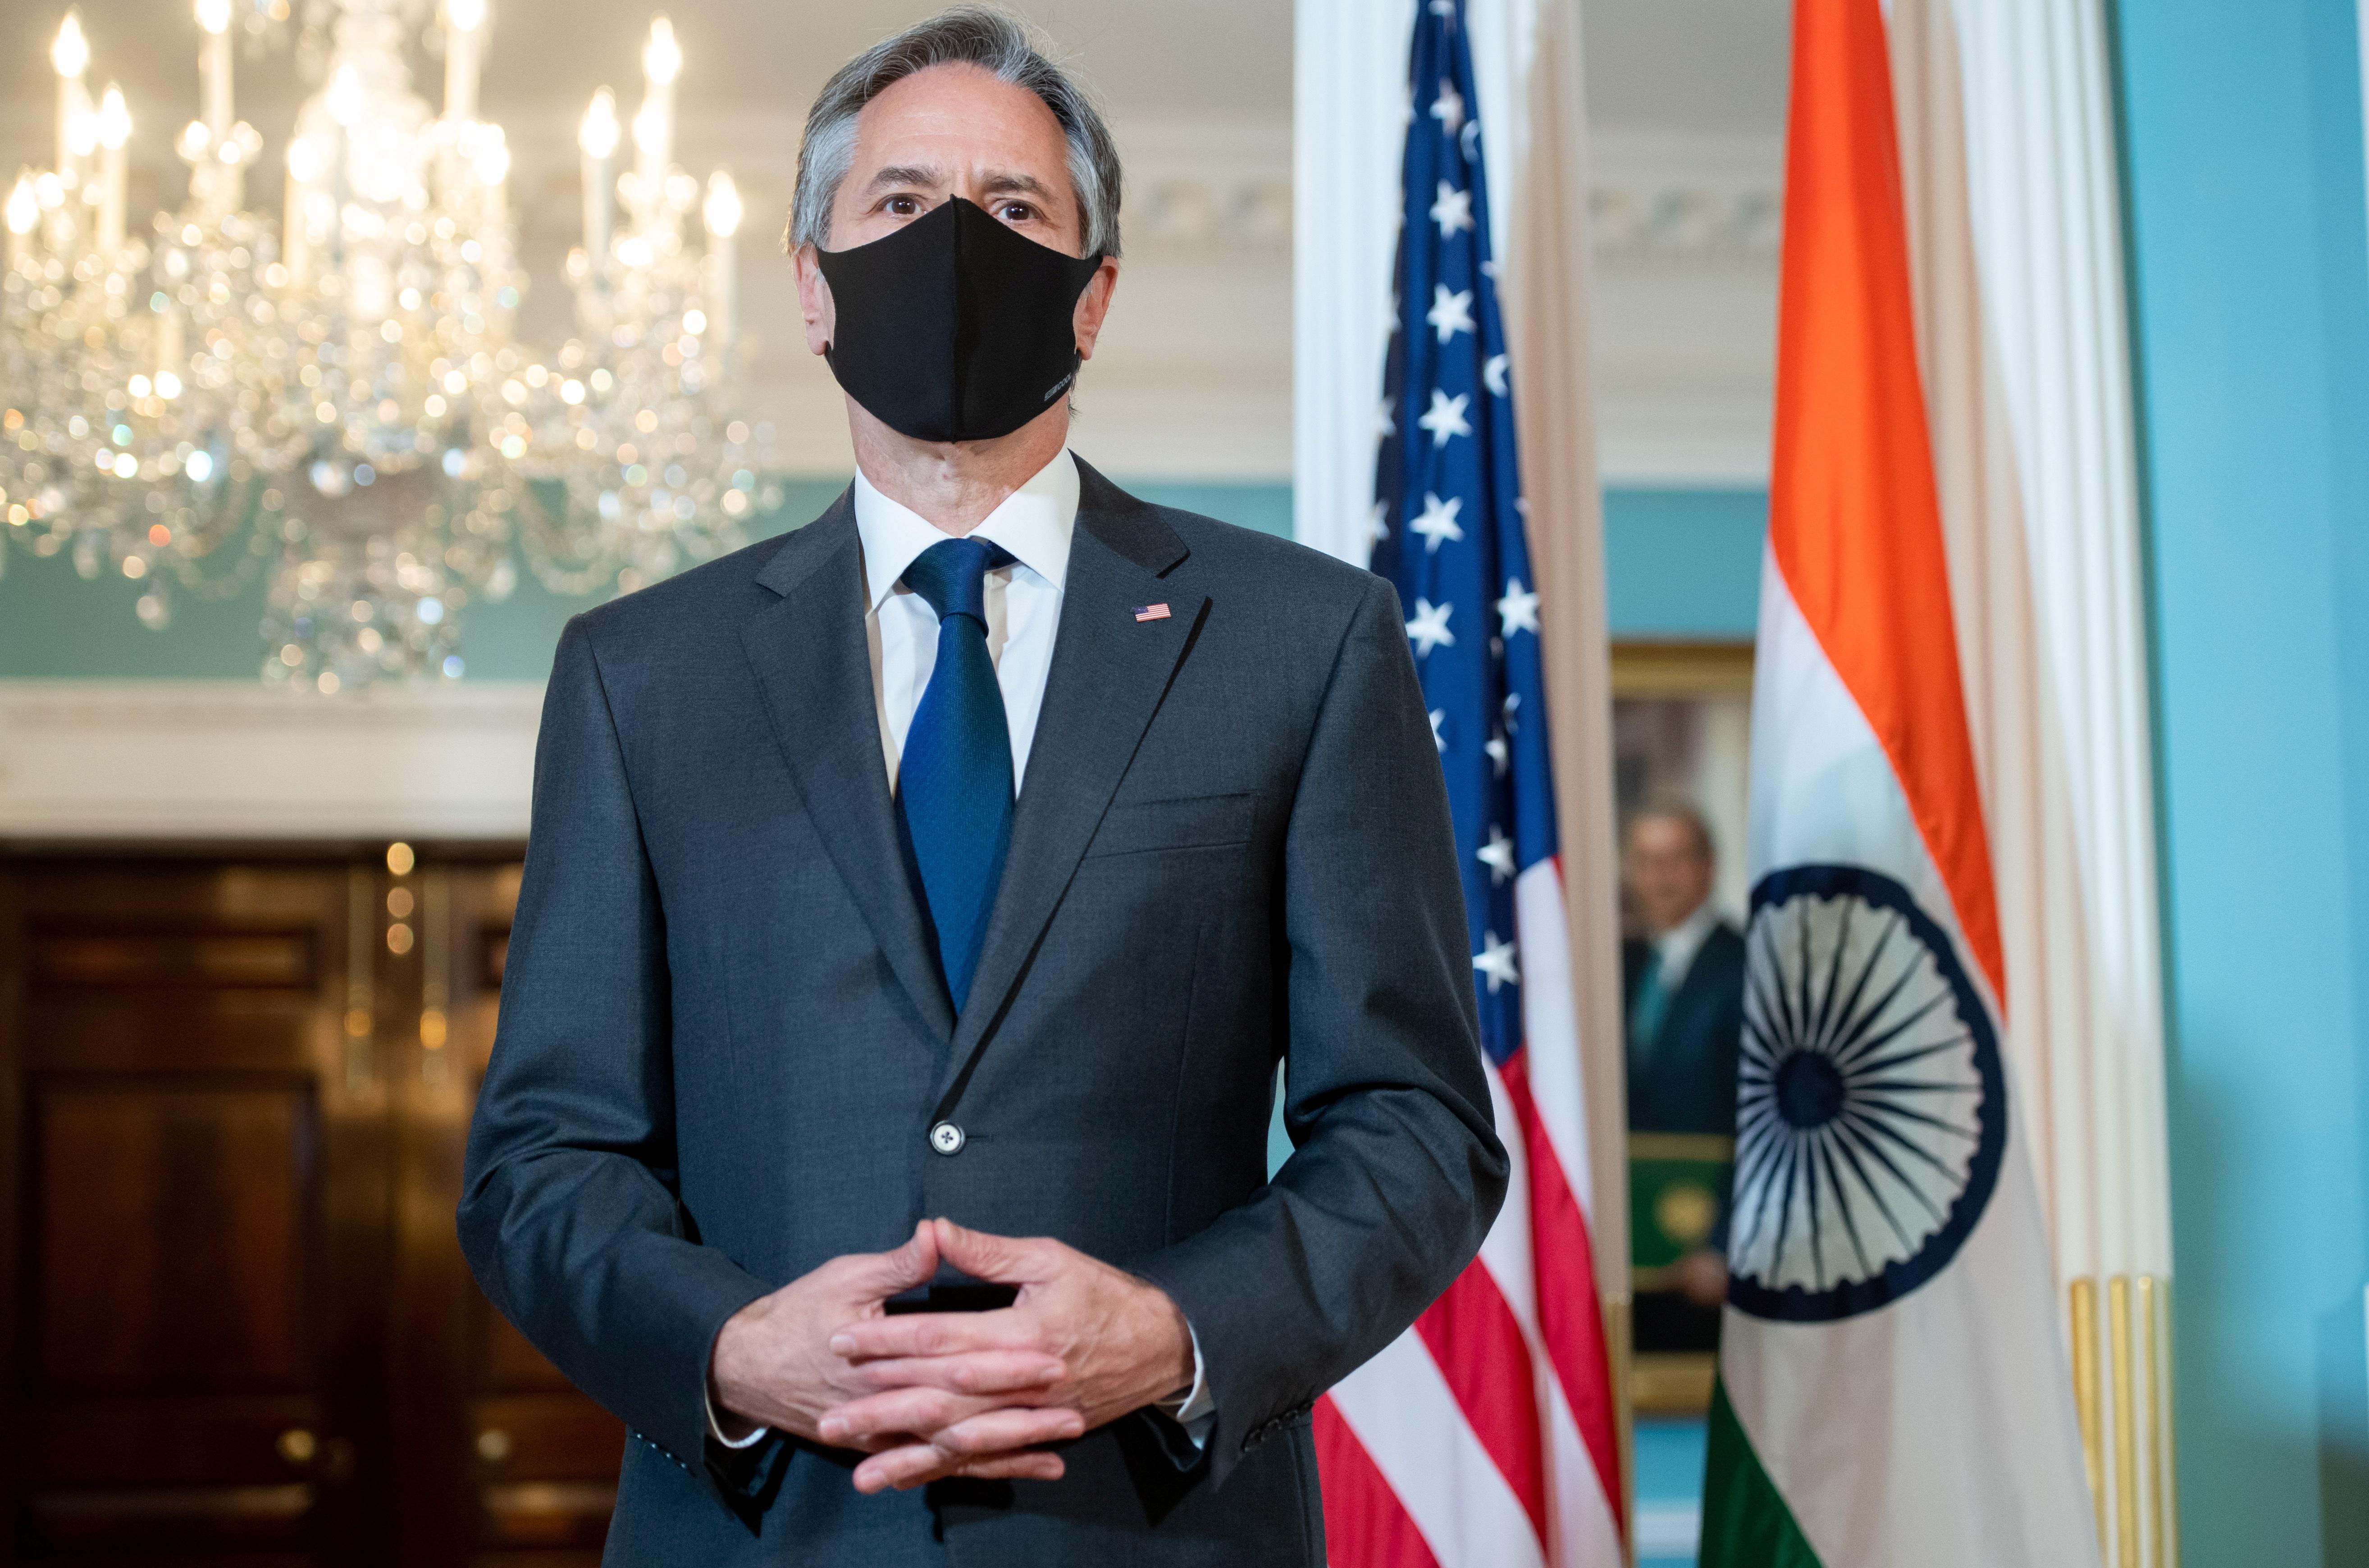 U.S. Secretary of State Antony Blinken speaks to the media prior a meeting with Indian External Affairs Minister Subrahmanyam Jaishankar  at the State Department in Washington, DC, U.S. May 28, 2021. Saul Loeb/Pool via REUTERS